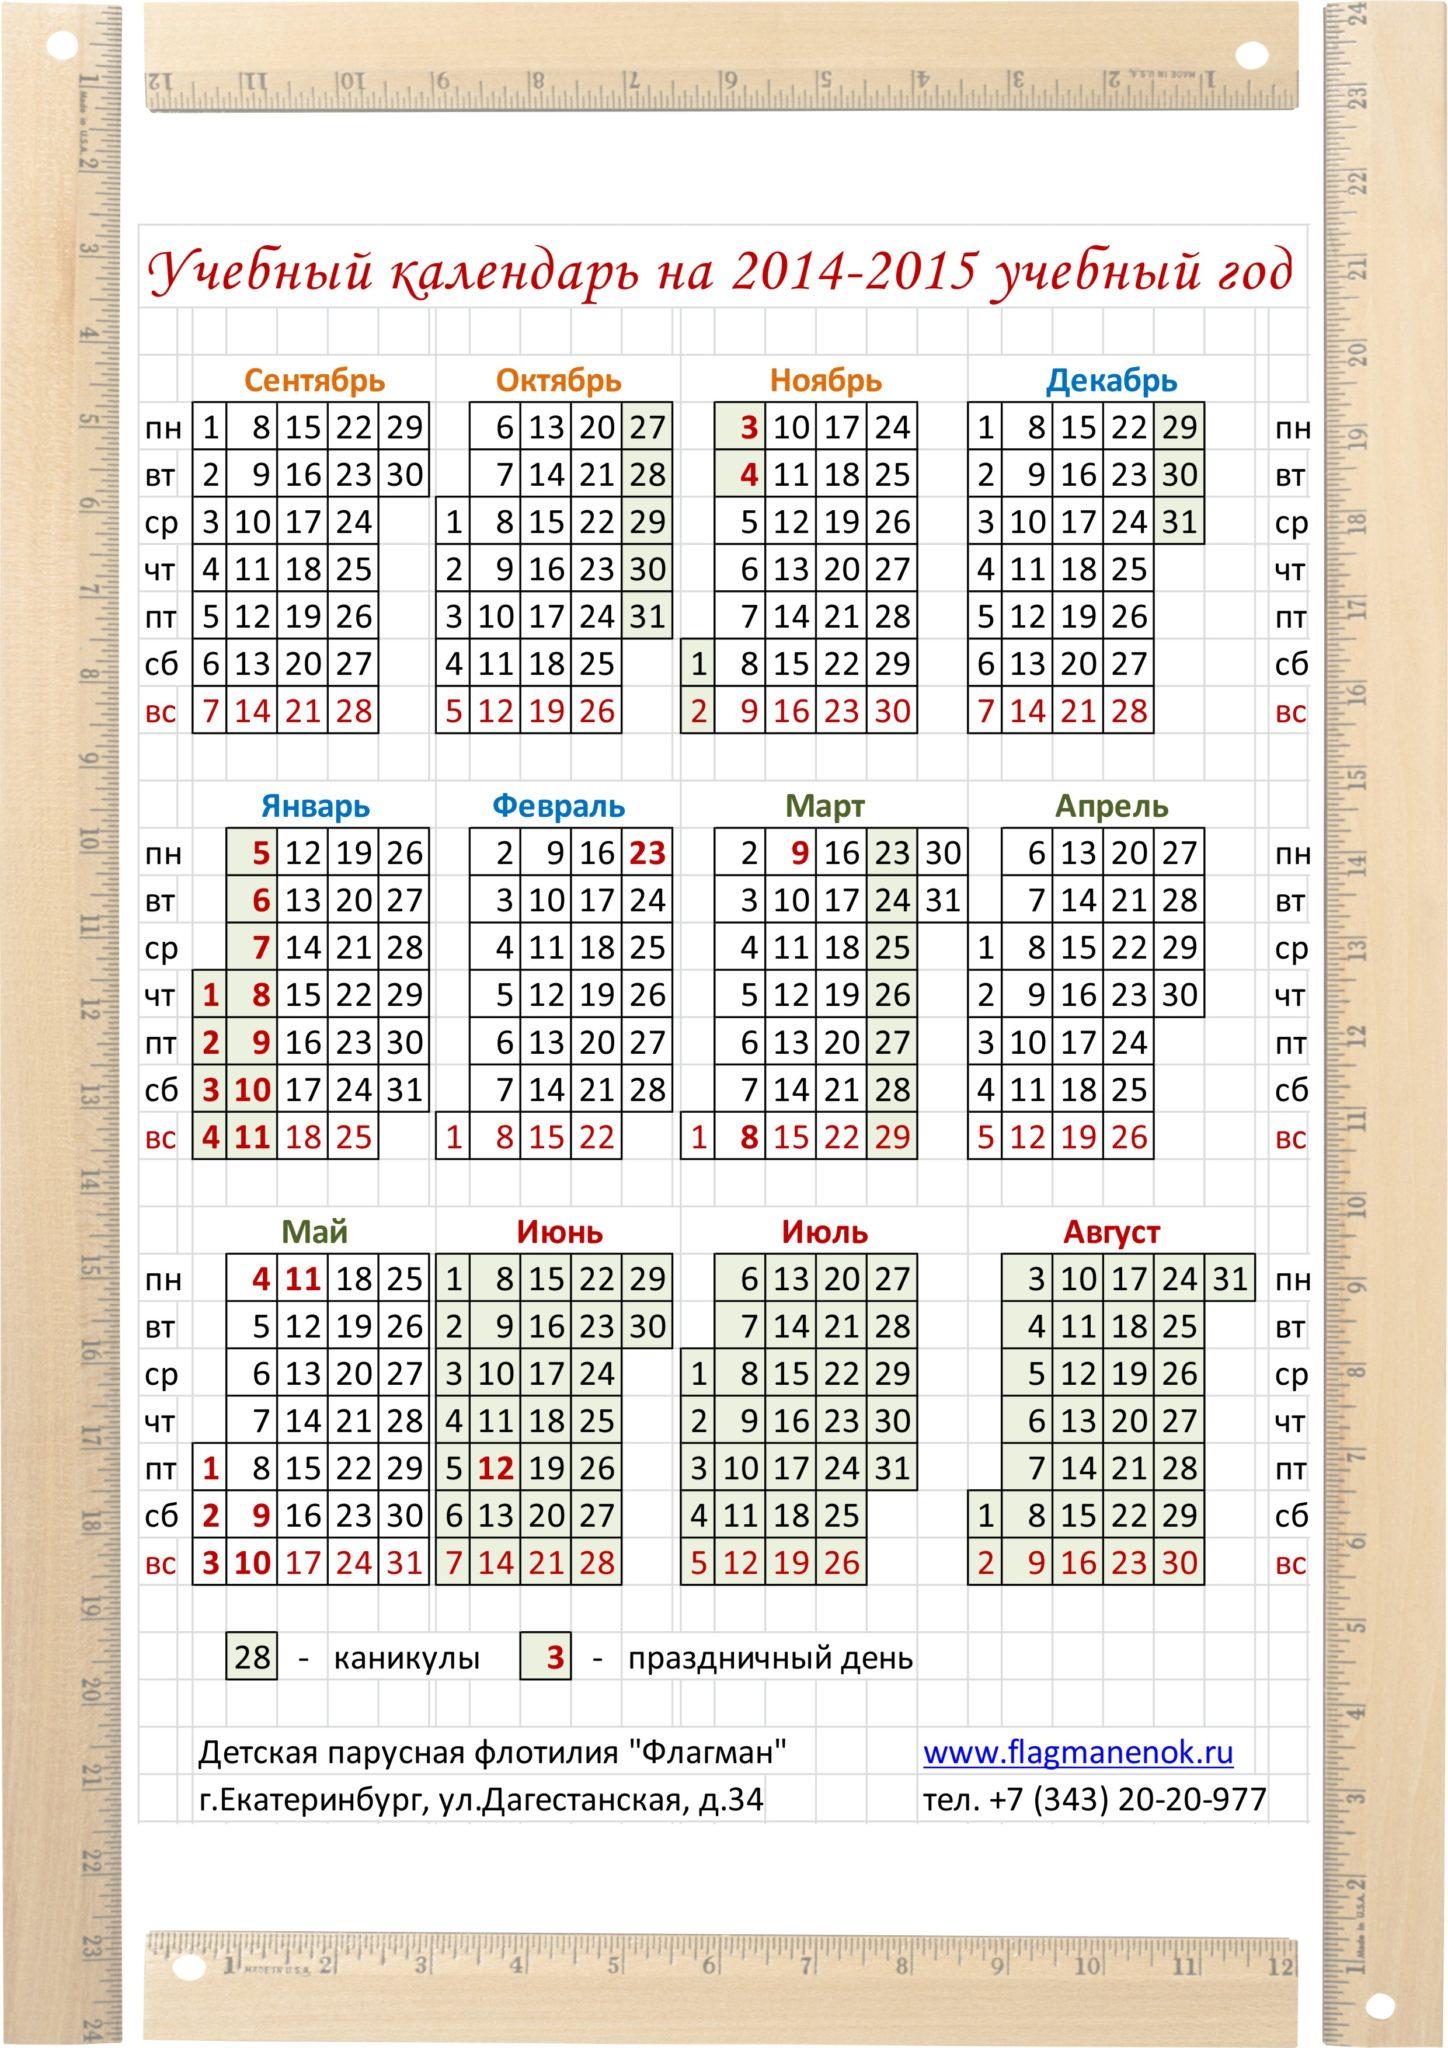 Школьные каникулы 2014-2015: www.flagmanenok.ru/2014/09/школьные-каникулы-2014-2015